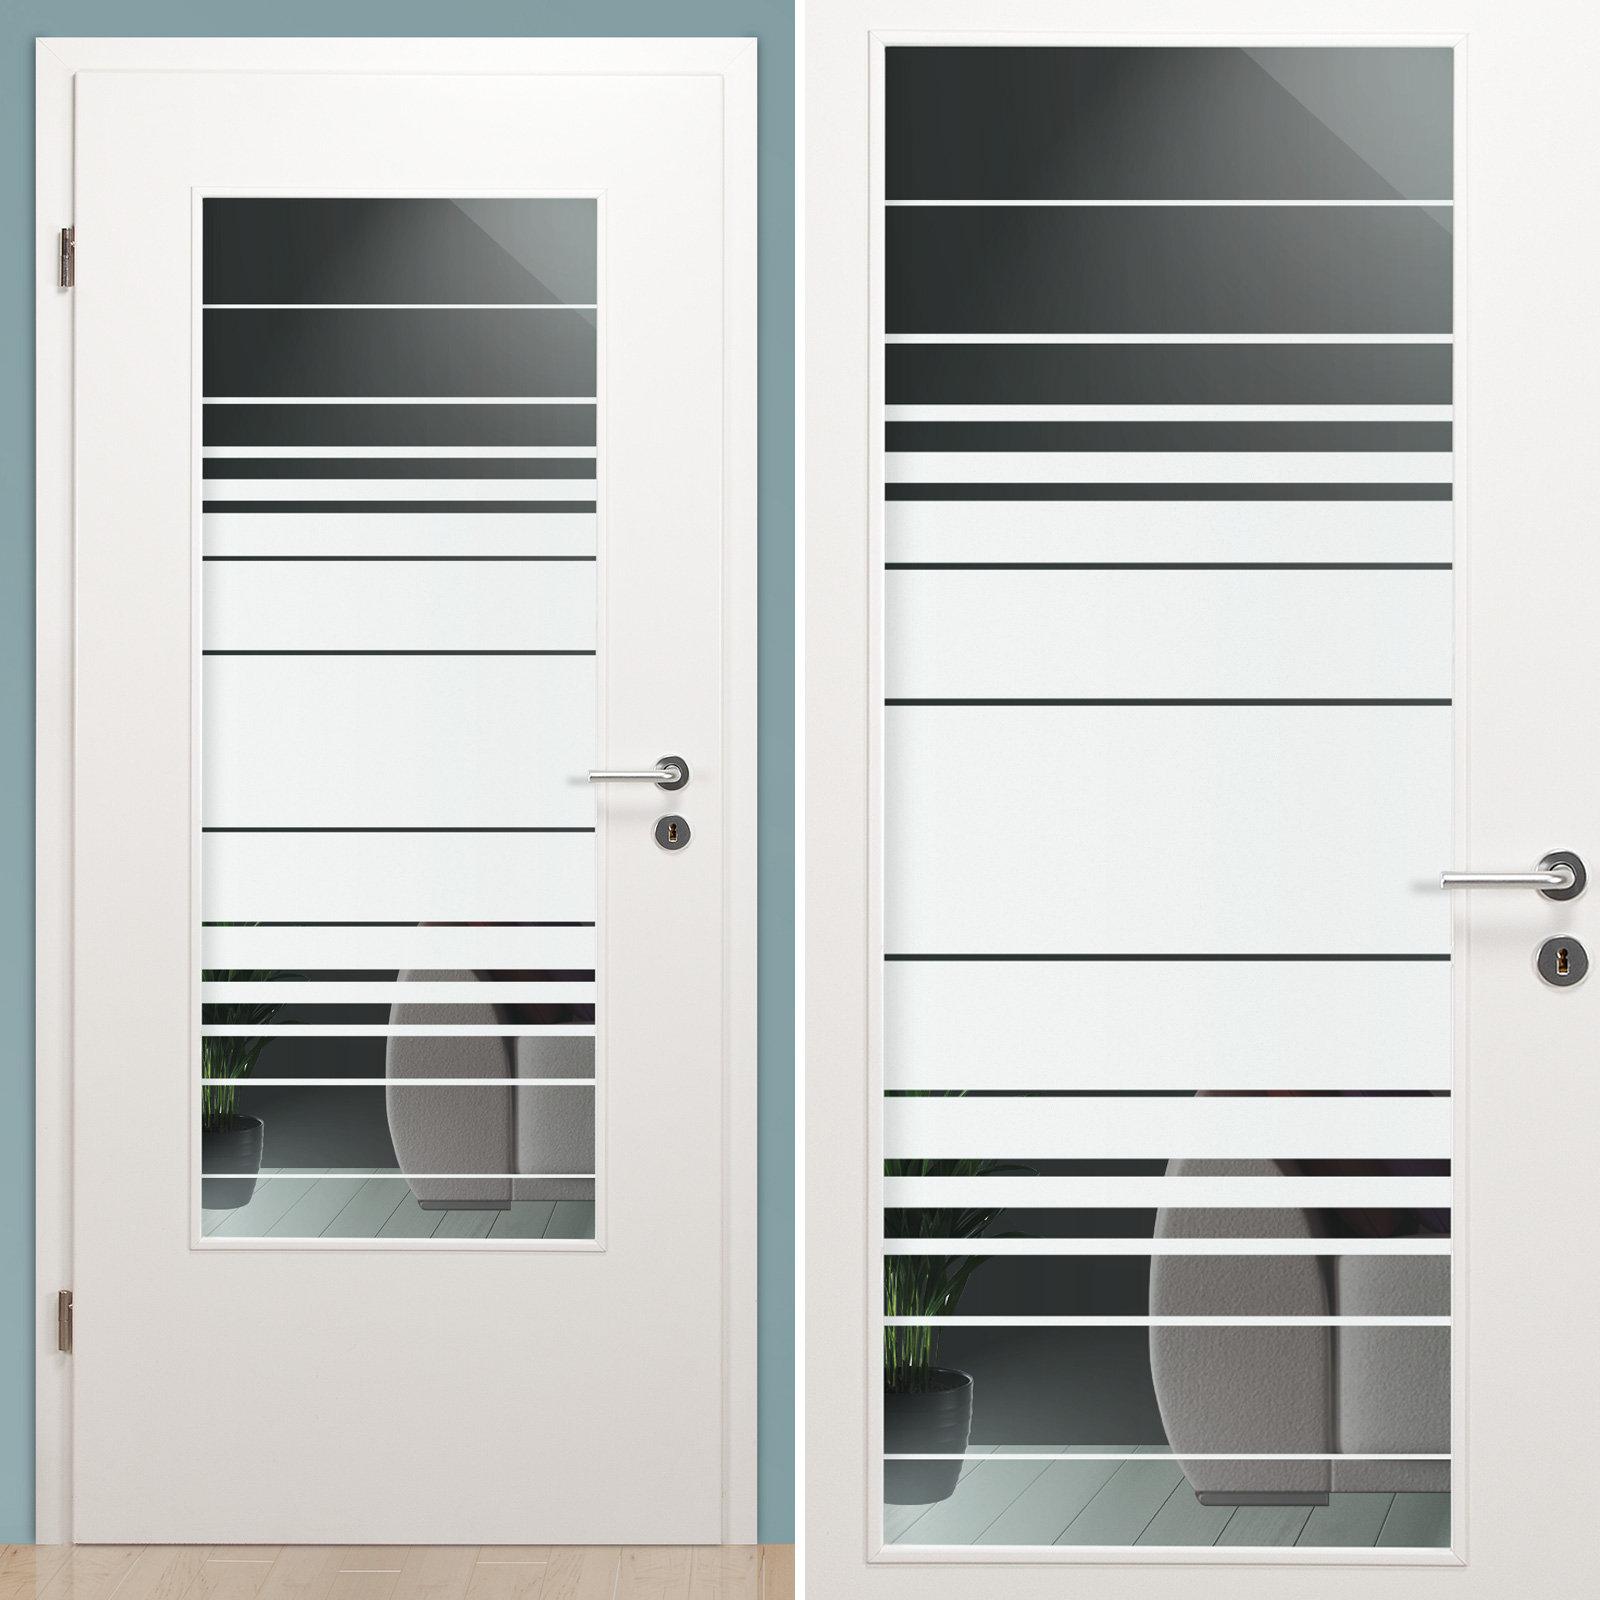 verglasung glaseinsatz f r holzt r 129 1 f la klarglas mit dekor office ebay. Black Bedroom Furniture Sets. Home Design Ideas